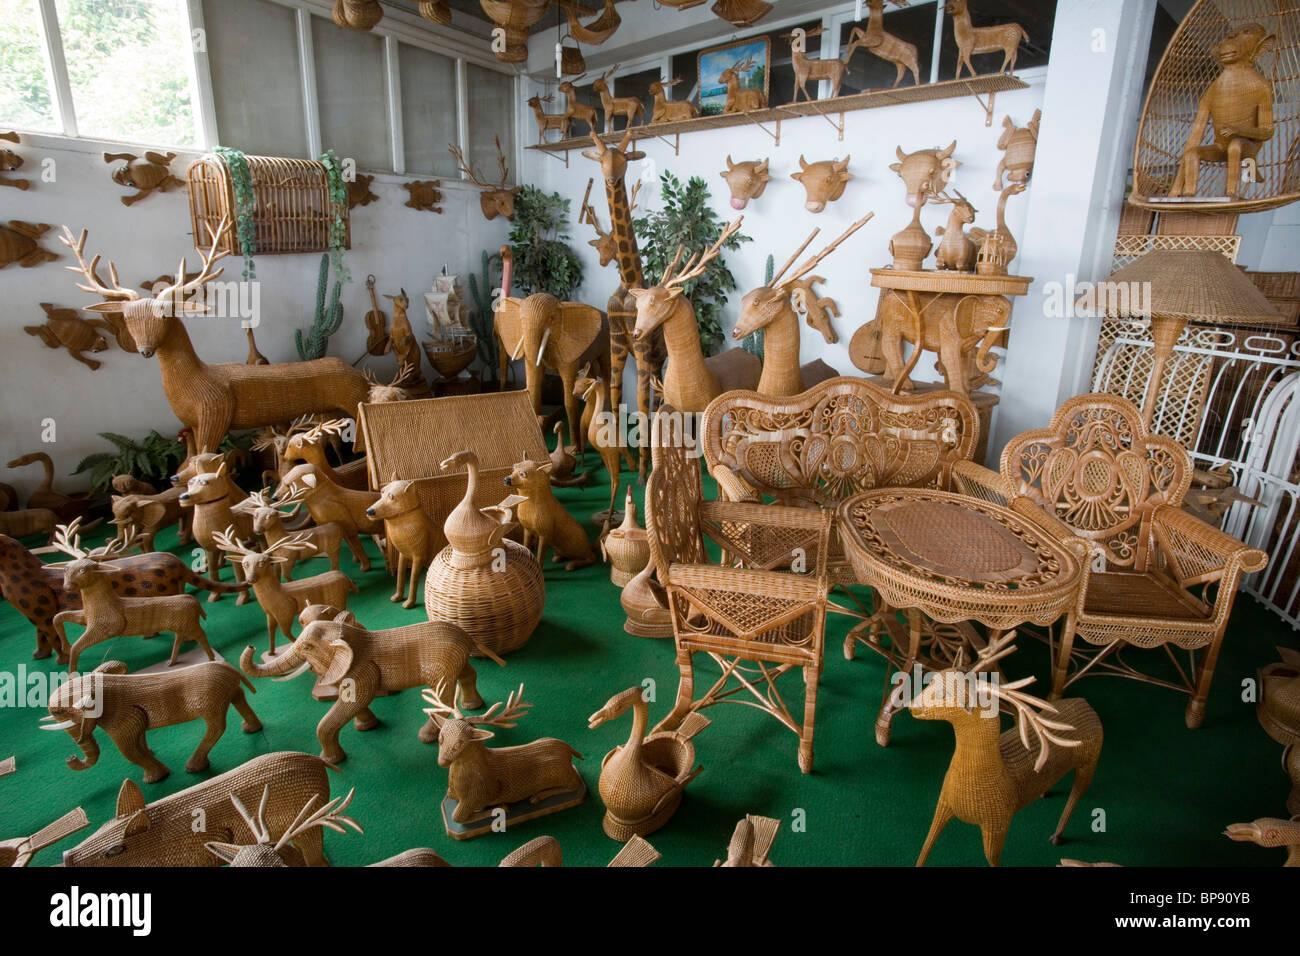 Handicrafts display at Cafe el Relogio Wicker Factory, Camacha, Madeira, Portugal - Stock Image